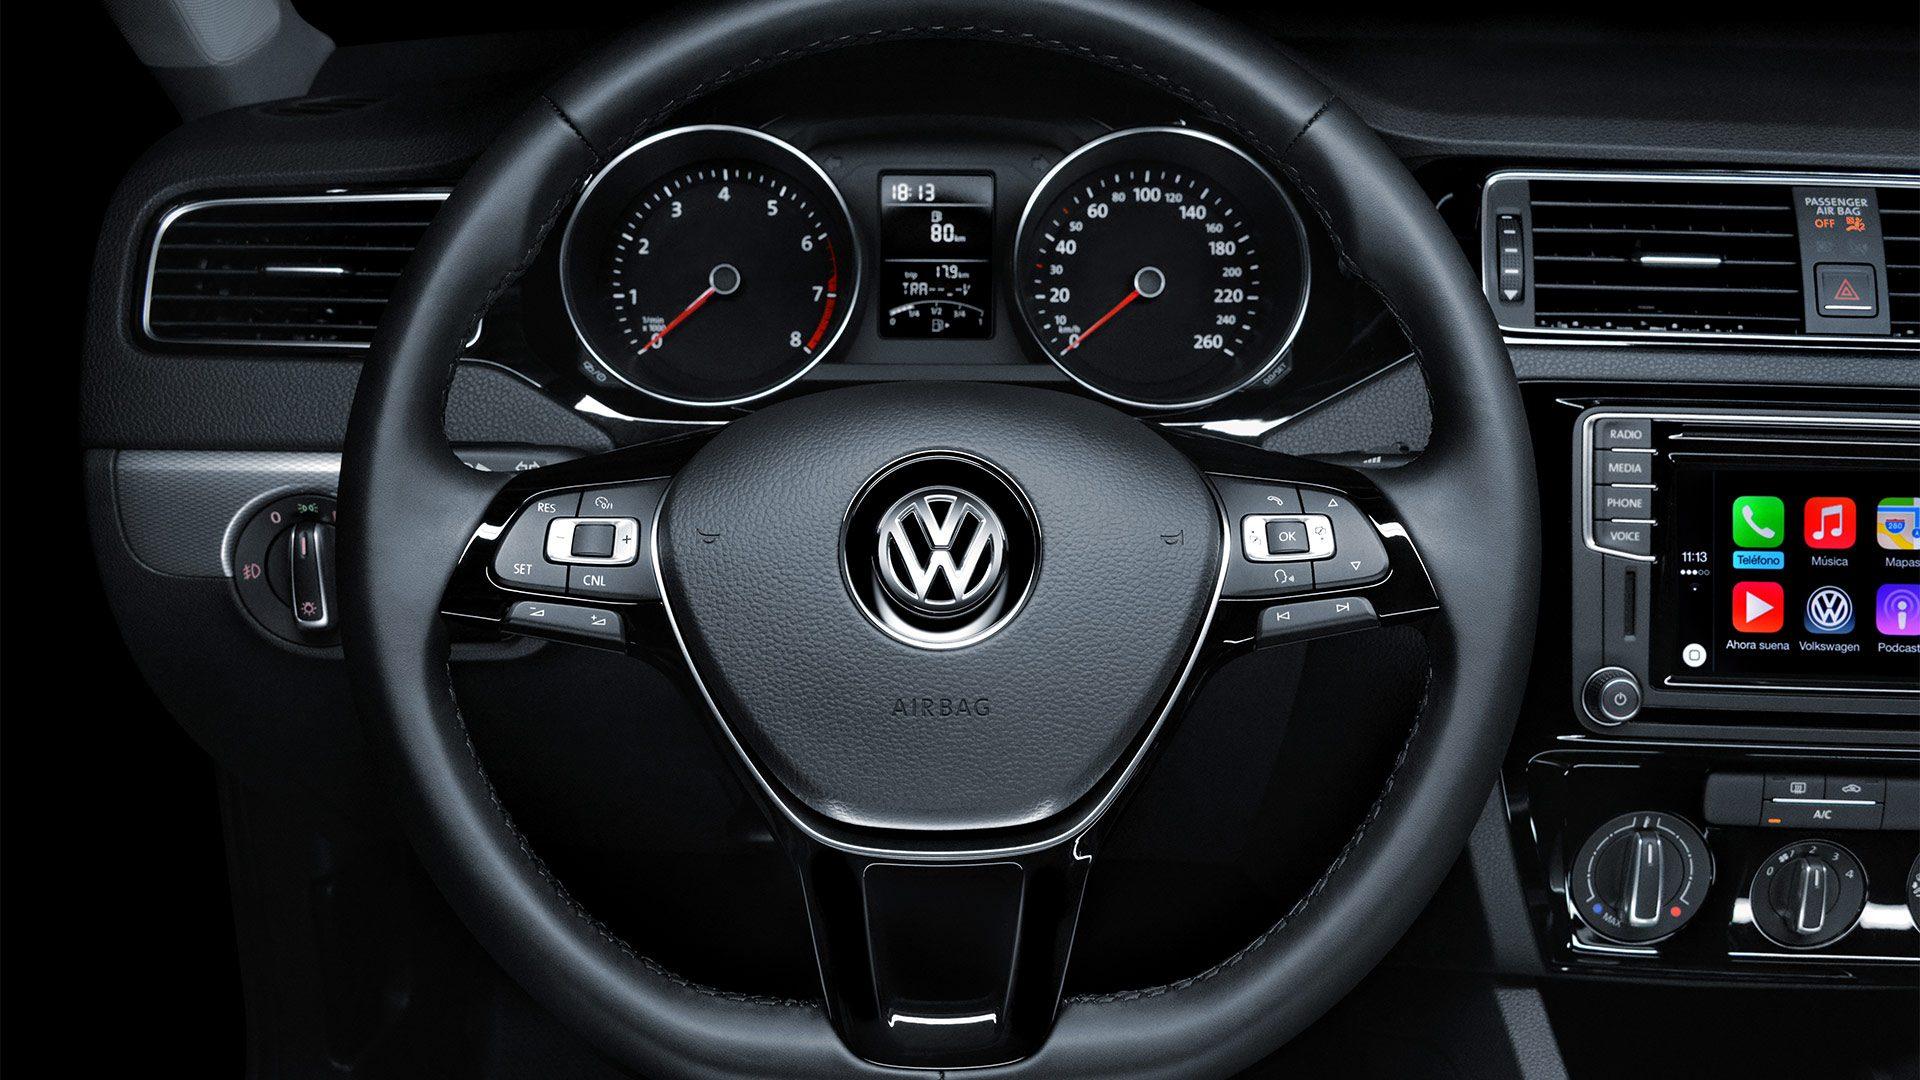 Volkswagen Jetta 2018 volante - Autos Actual México